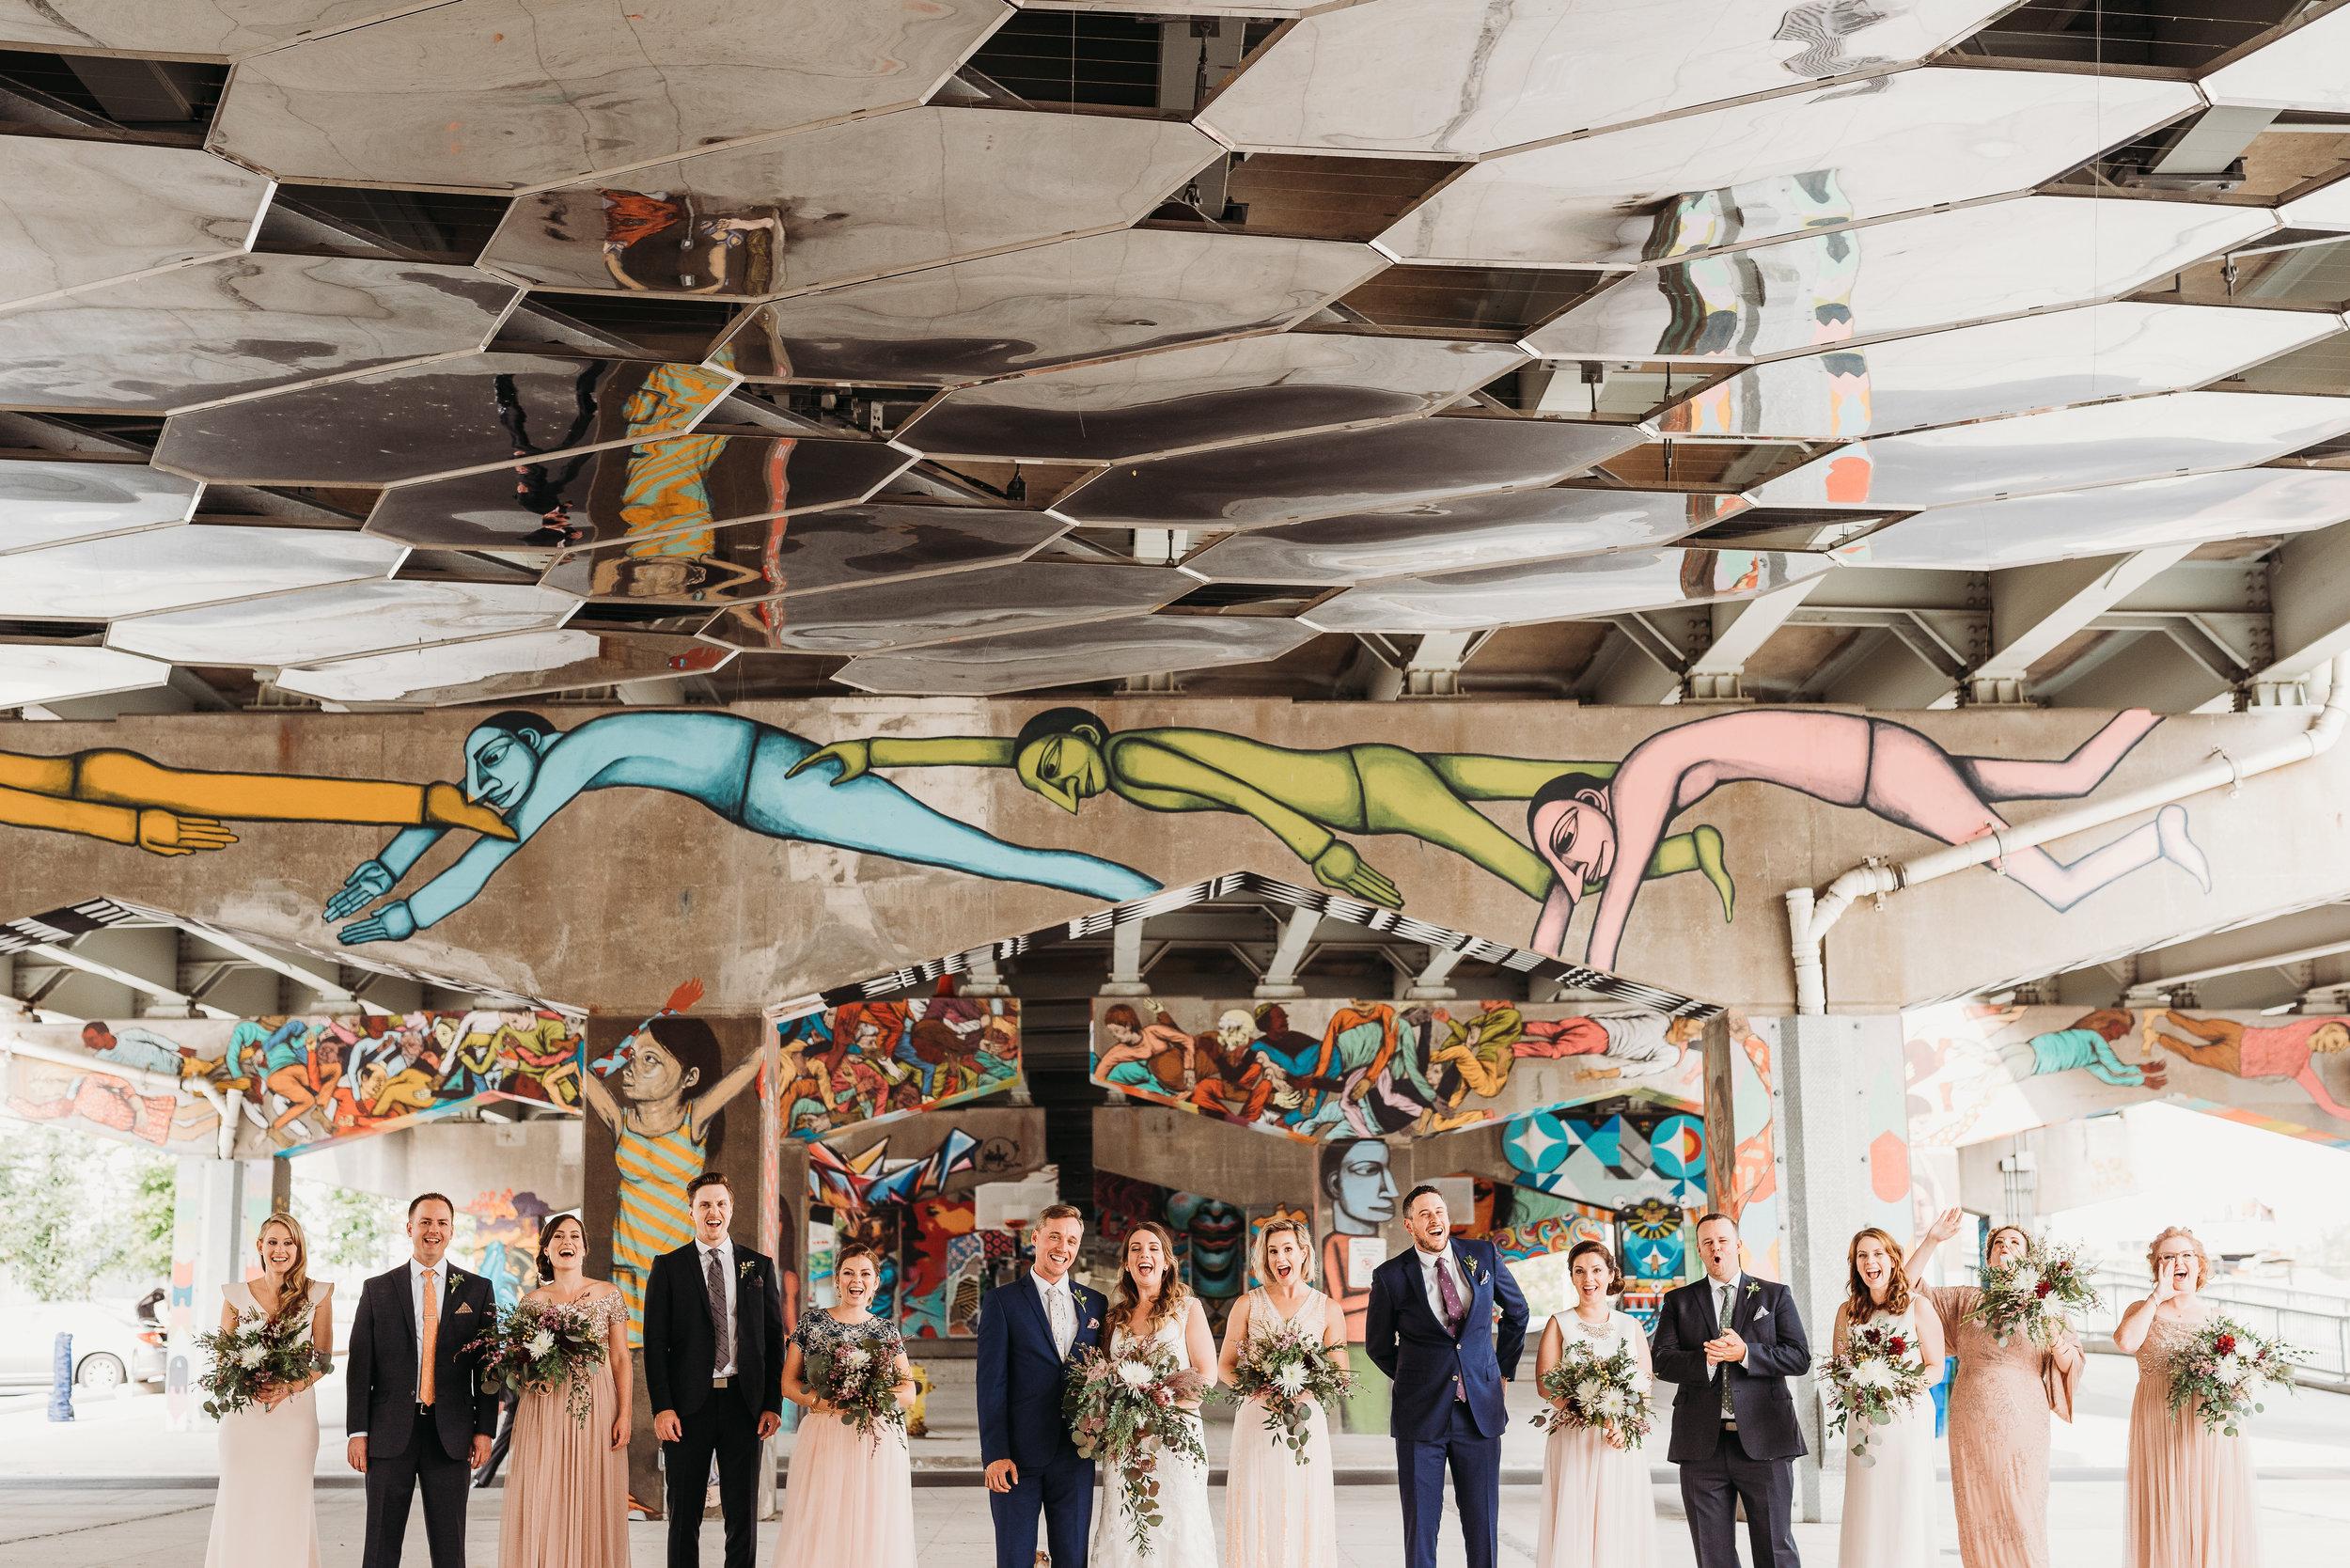 wedding-party-pictures-underpass-park-toronto-rustic-boho-airship37-wedding-by-willow-birch-photo-toronto-documentary-wedding-photographers.jpg